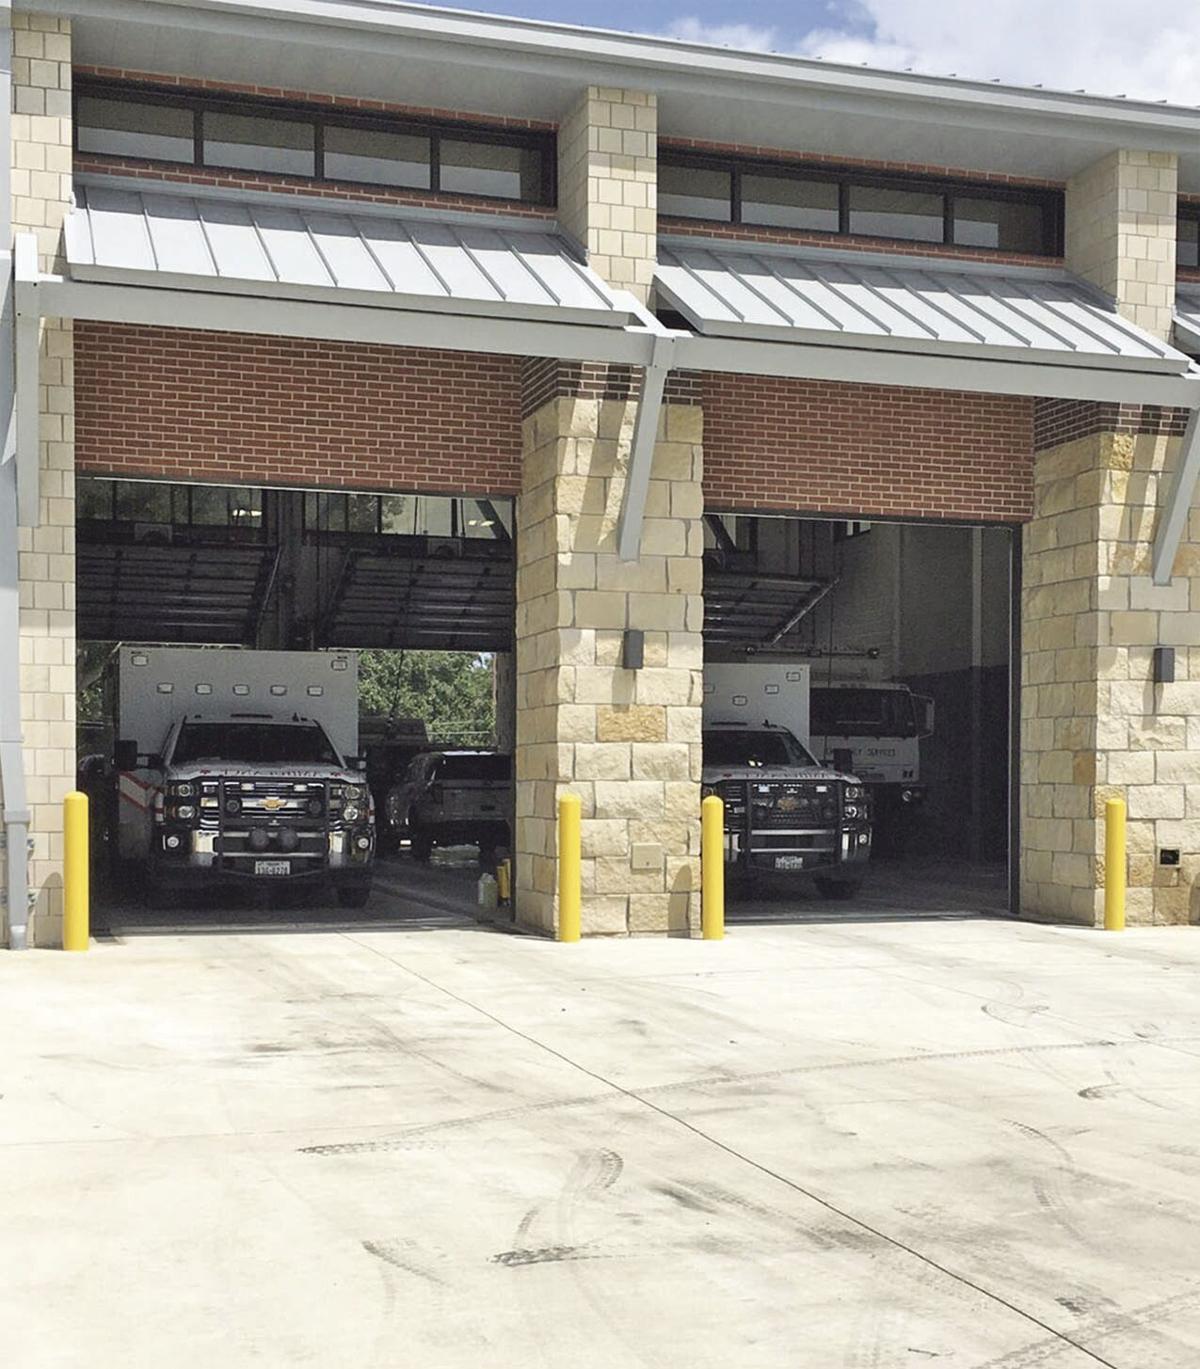 Ambulances at new station